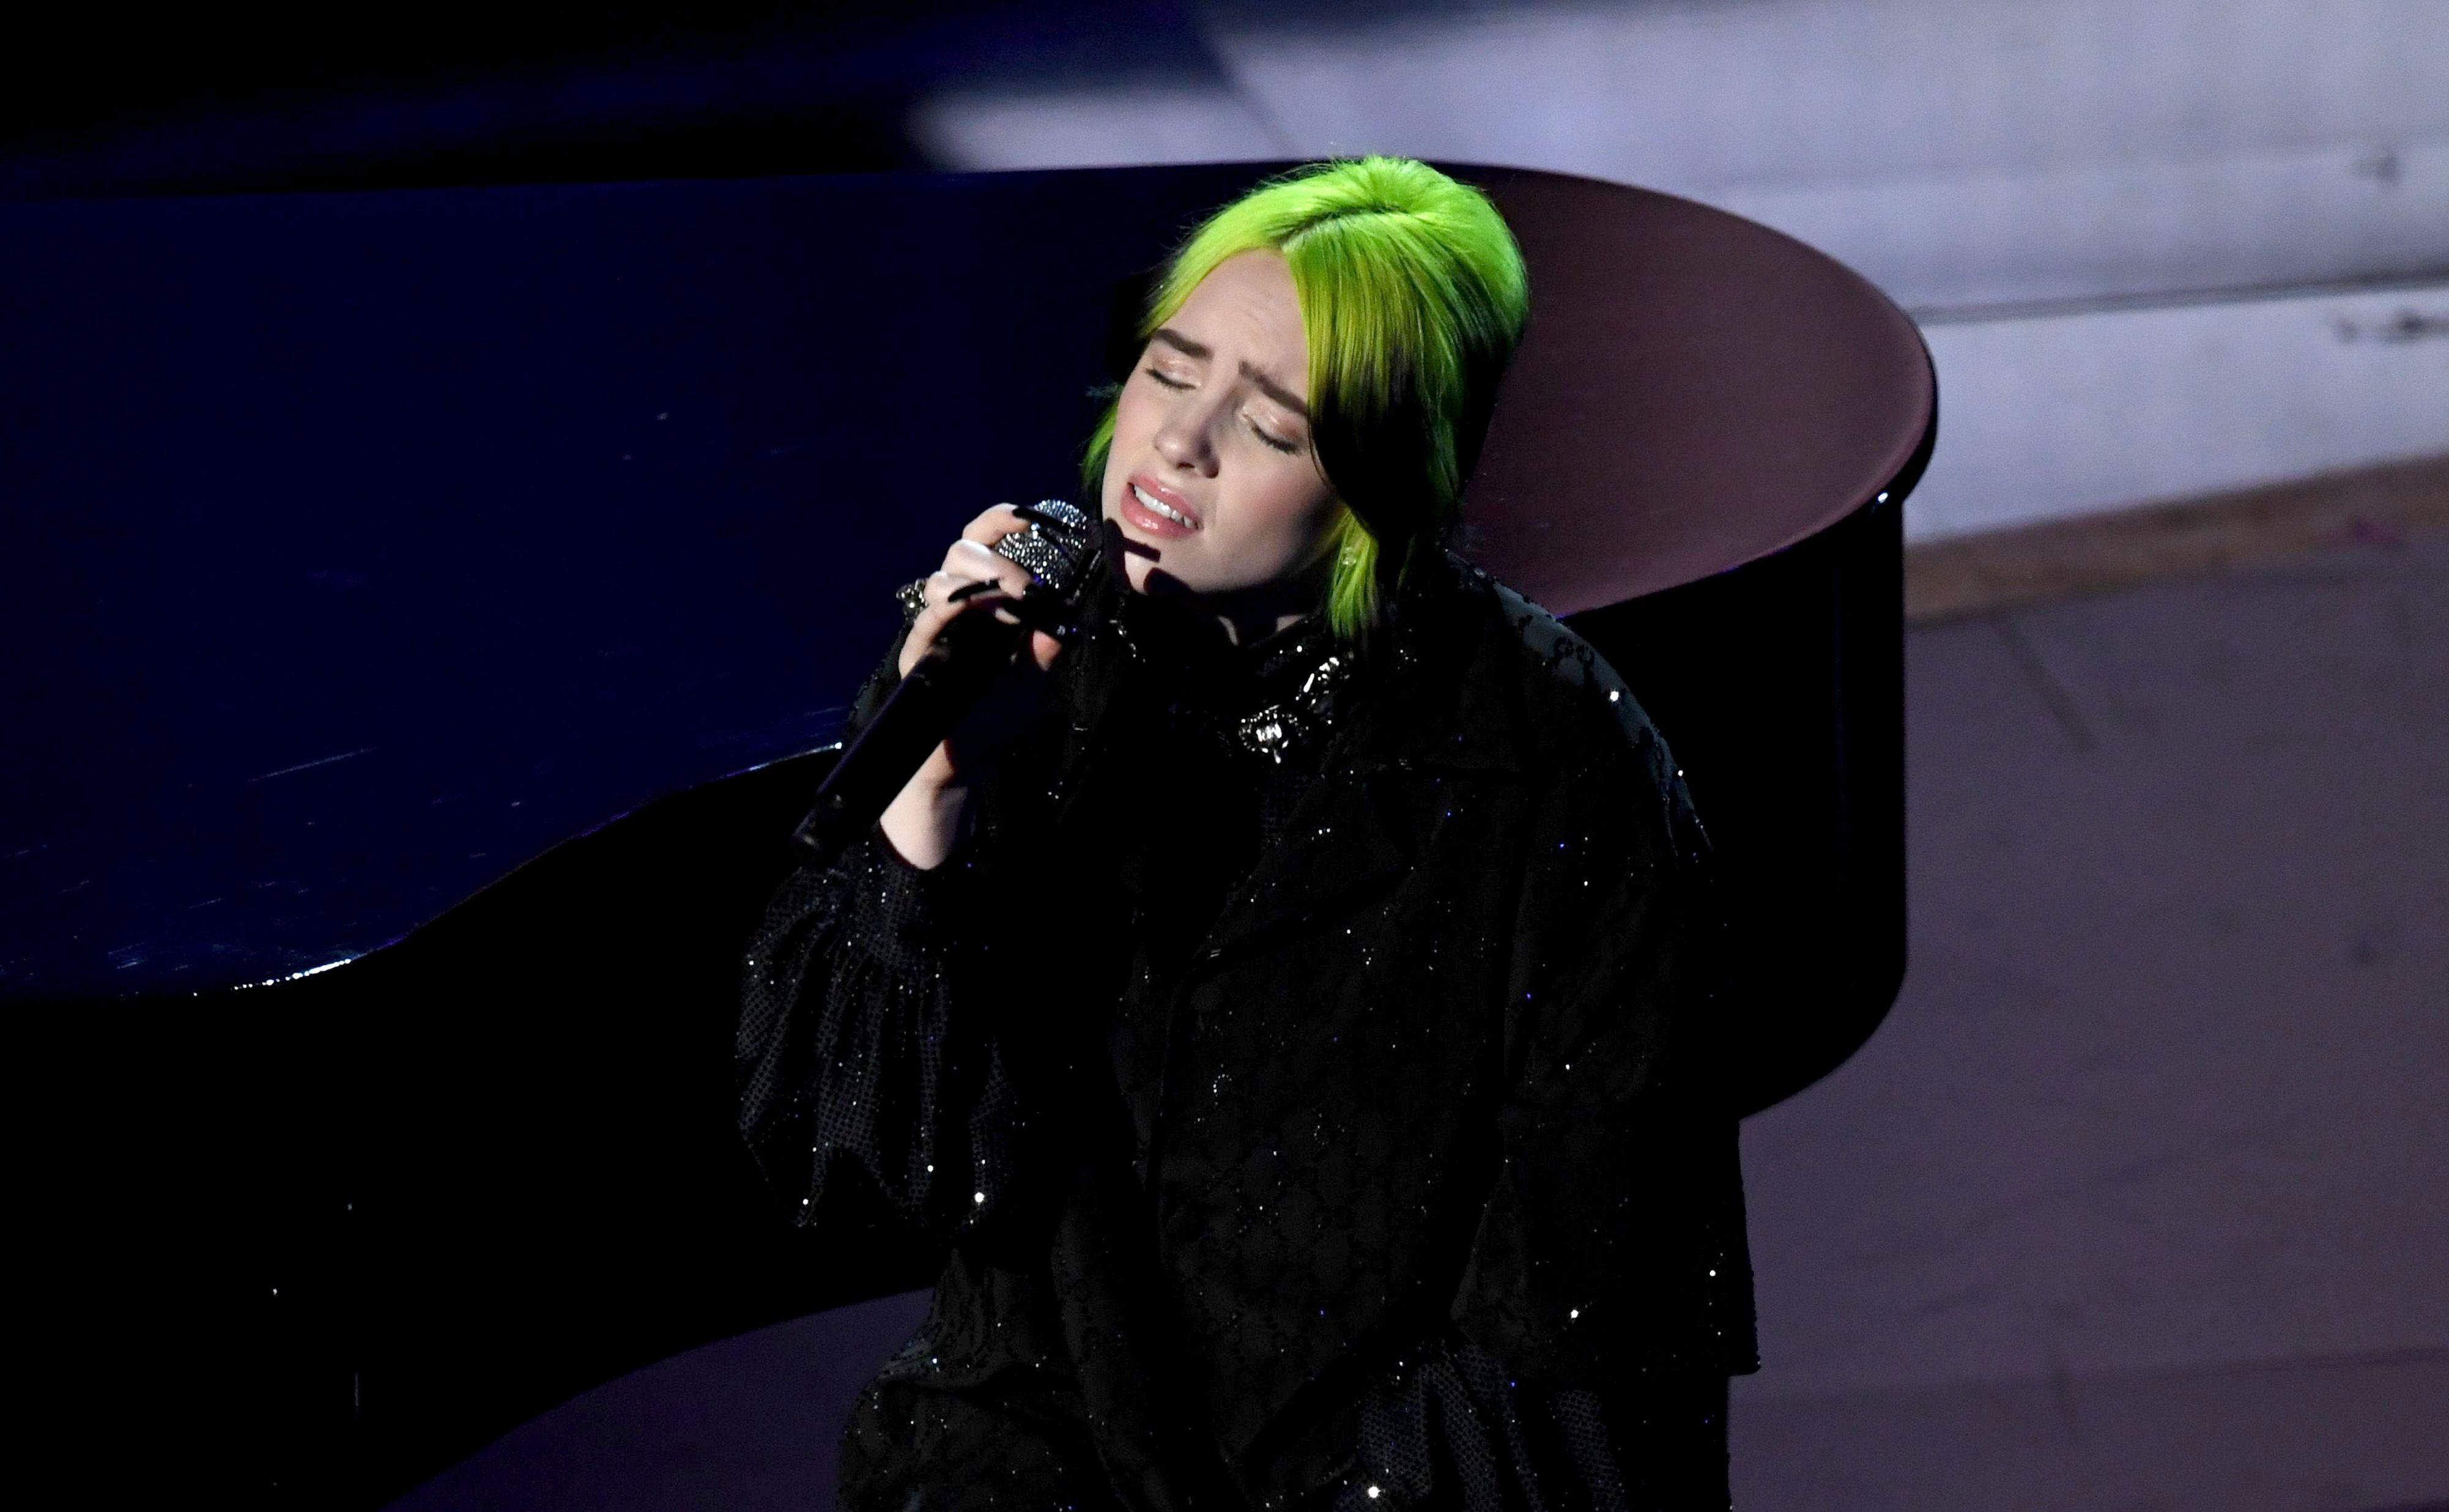 Billie Eilish on Her 'Bombed' Oscars Performance: 'That Sh*t Was Trash'